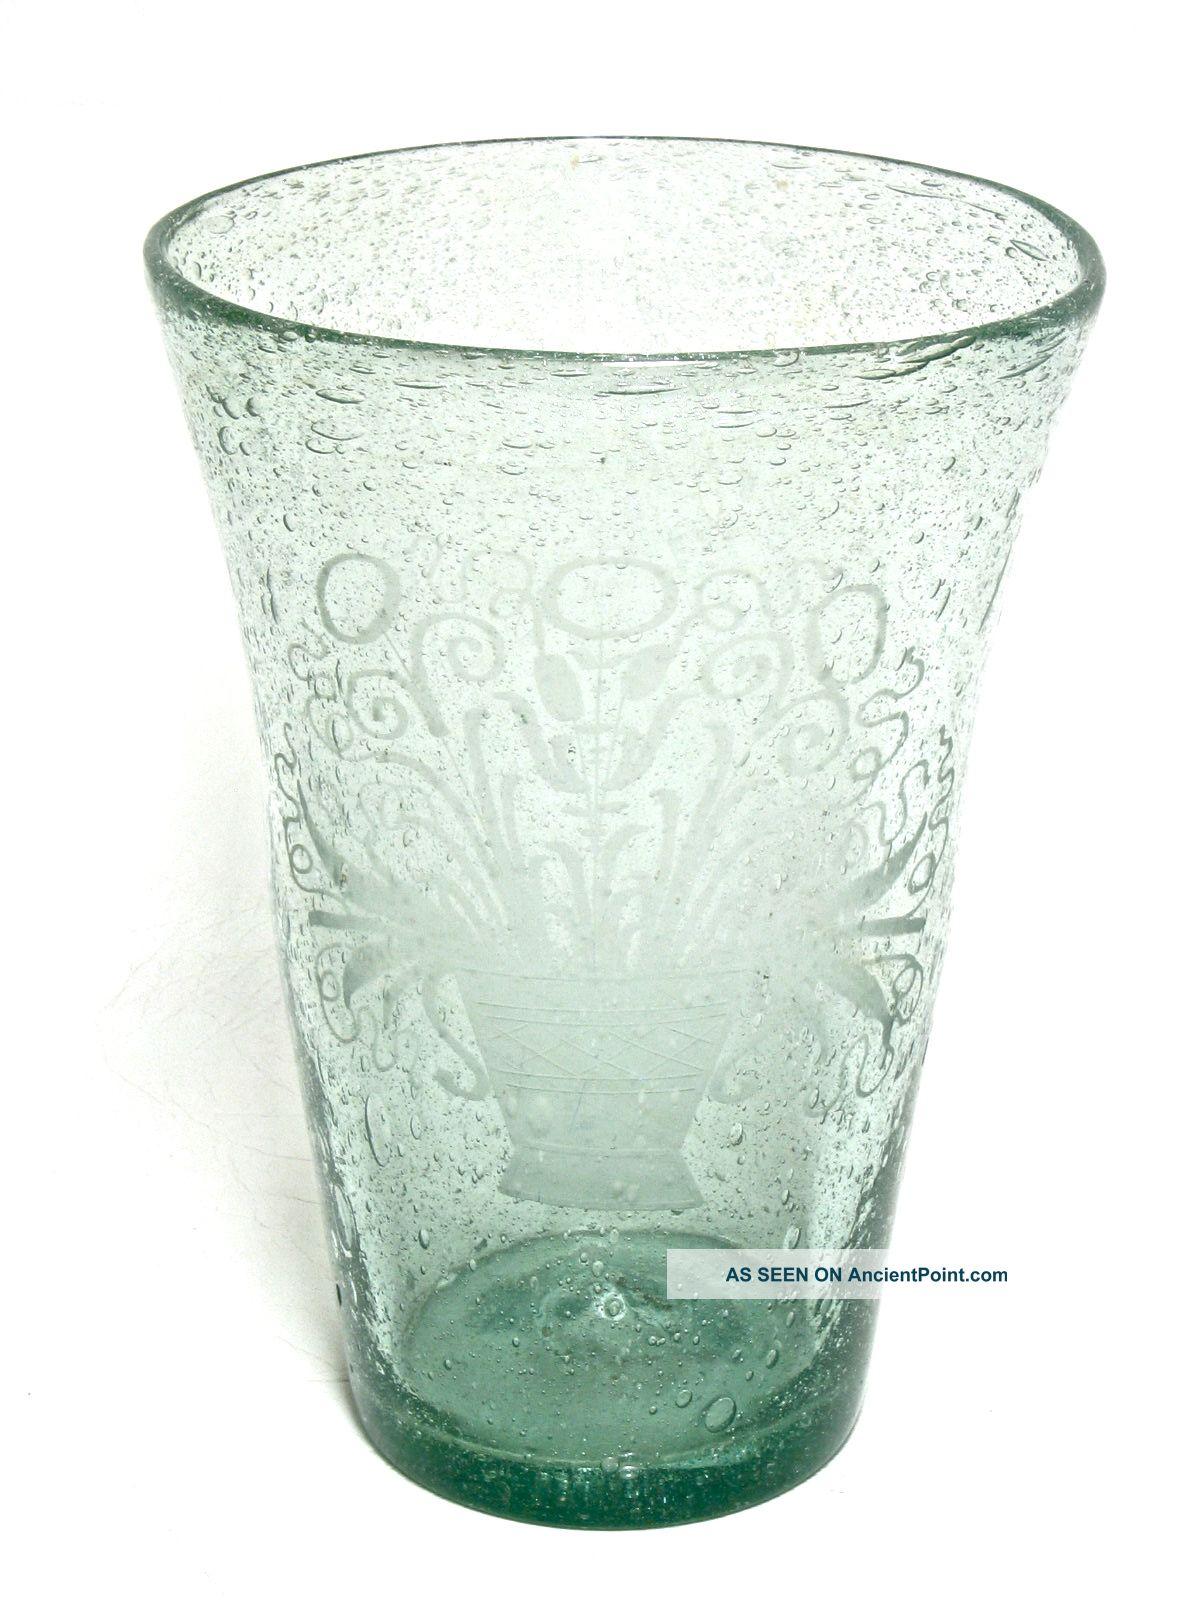 Antique american aqua flip glass bubble vase etched flower bouquet antique american aqua flip glass bubble vase etched flower bouquet rough pontil reviewsmspy